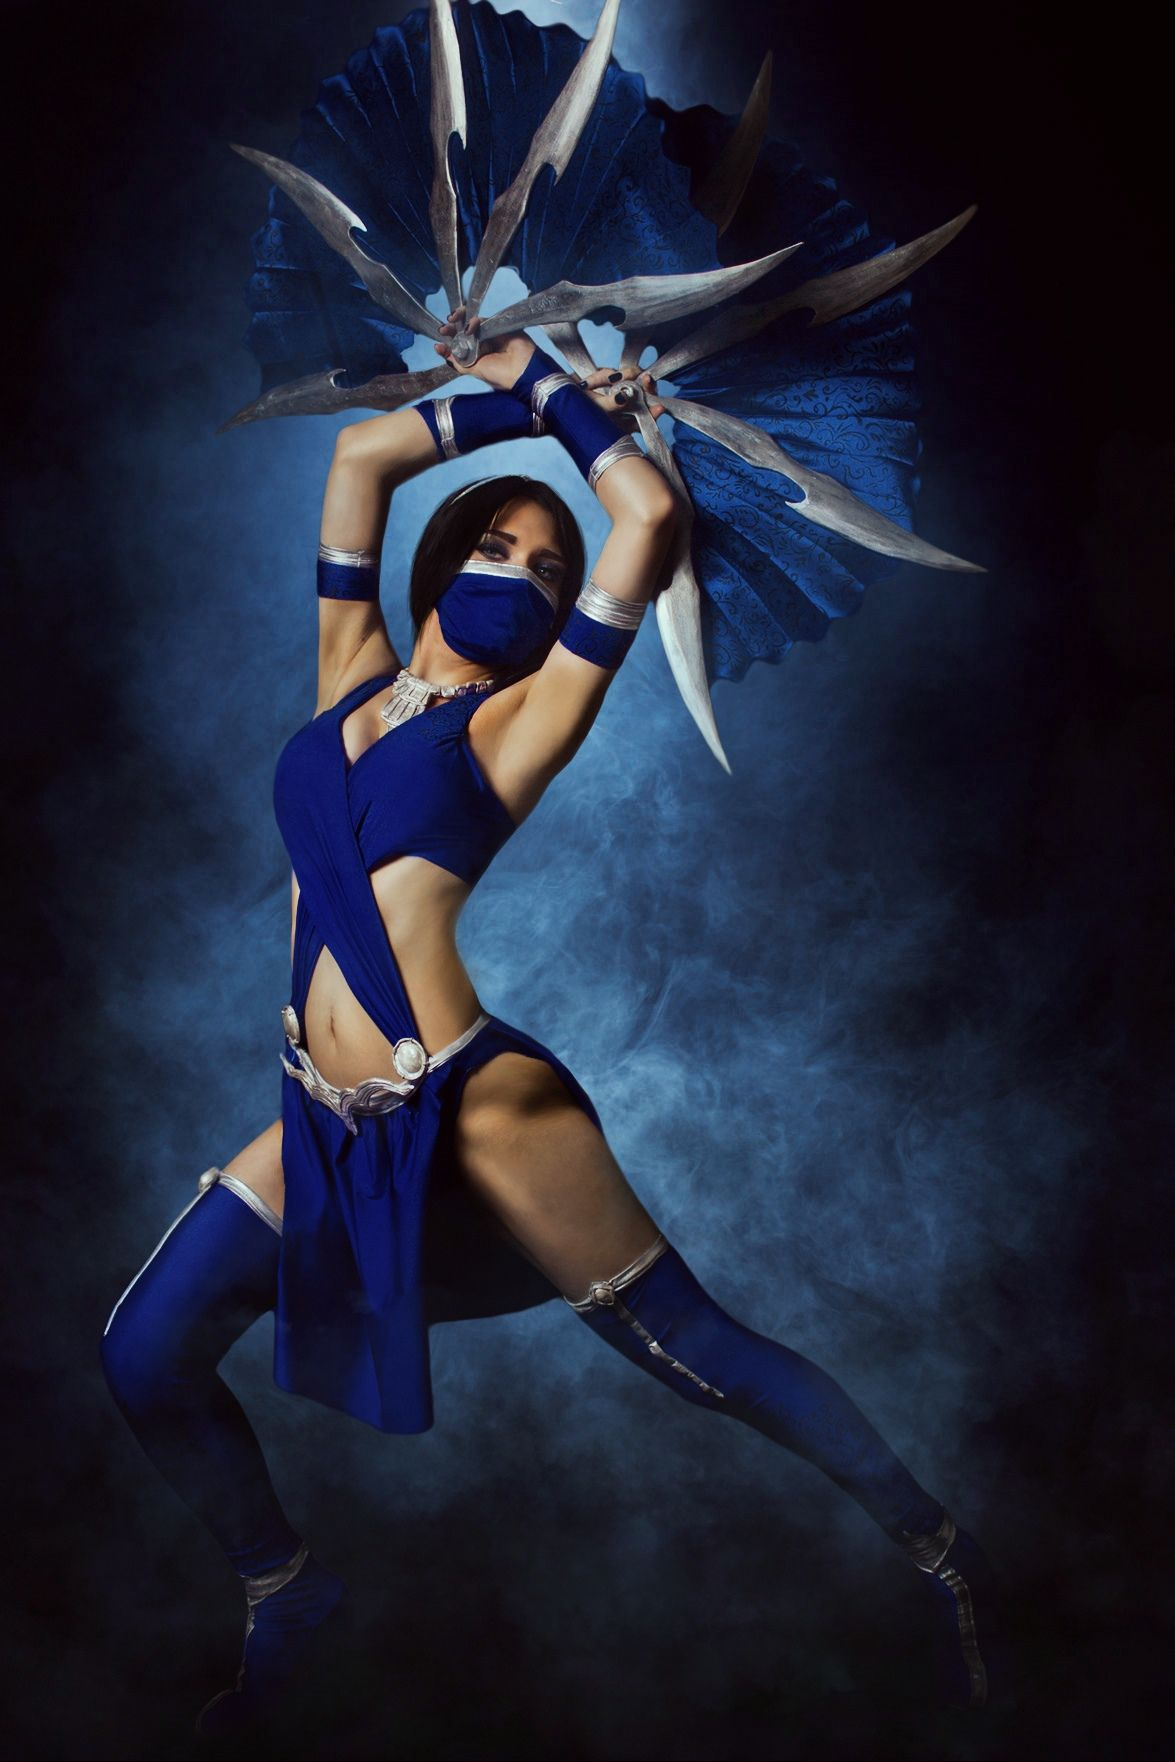 Fendom Mortal Kombat X Personazh Kitana Tournament Costume